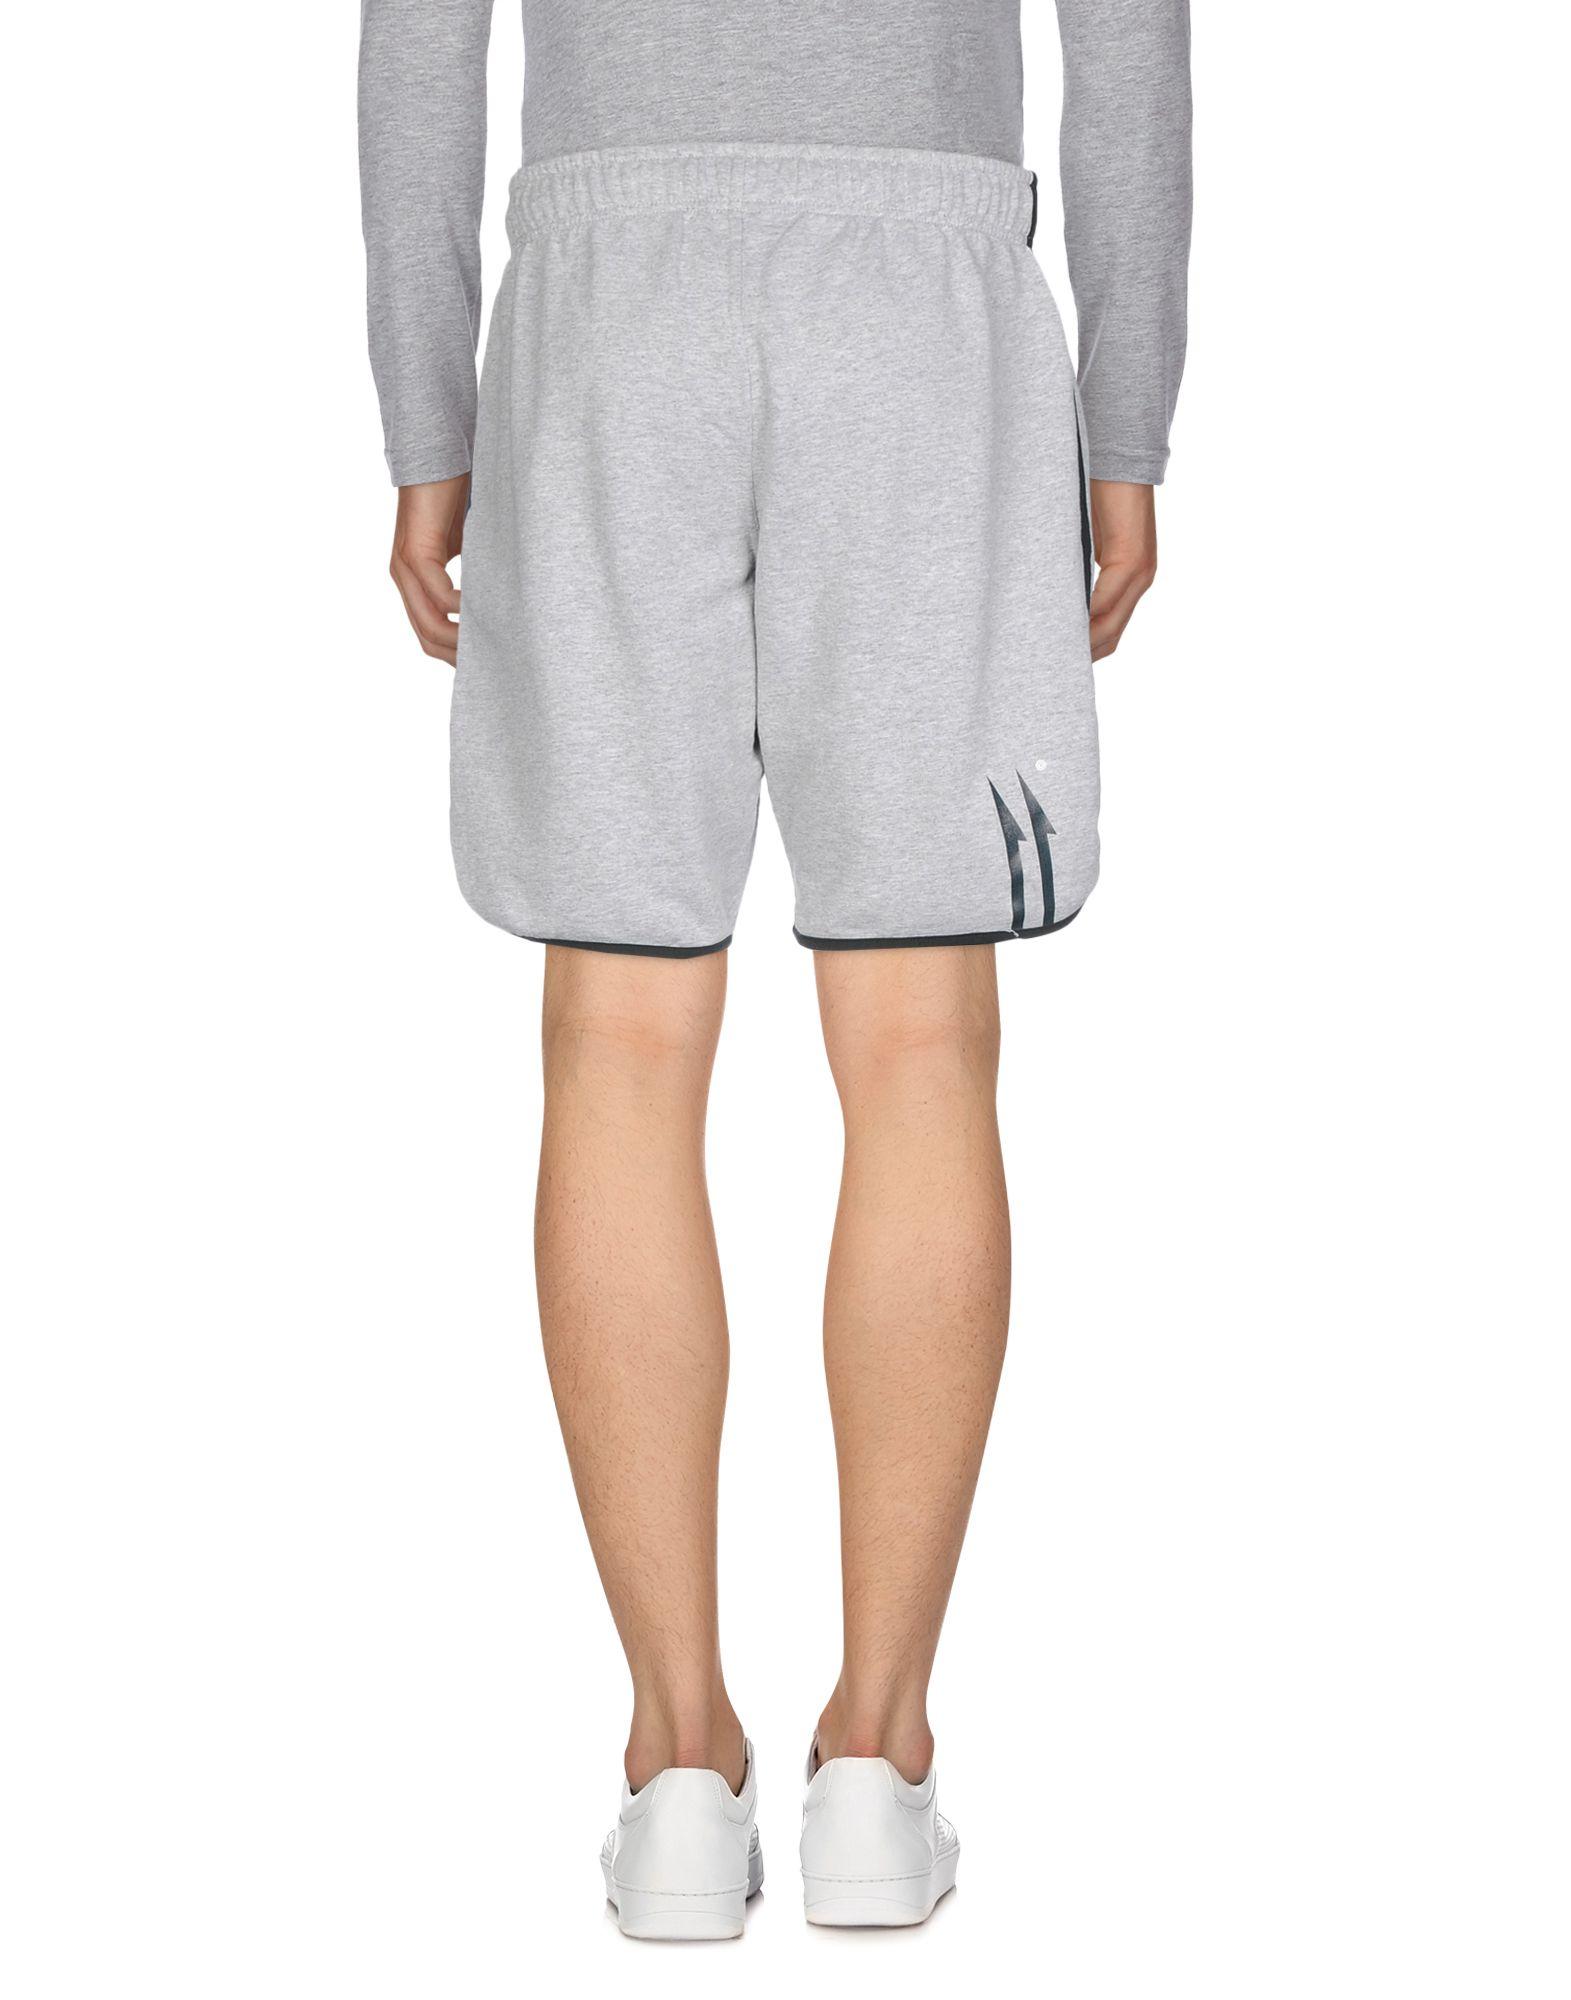 Pantalone Felpa So-Upwear Uomo Uomo So-Upwear - 13168459LX 51a89b